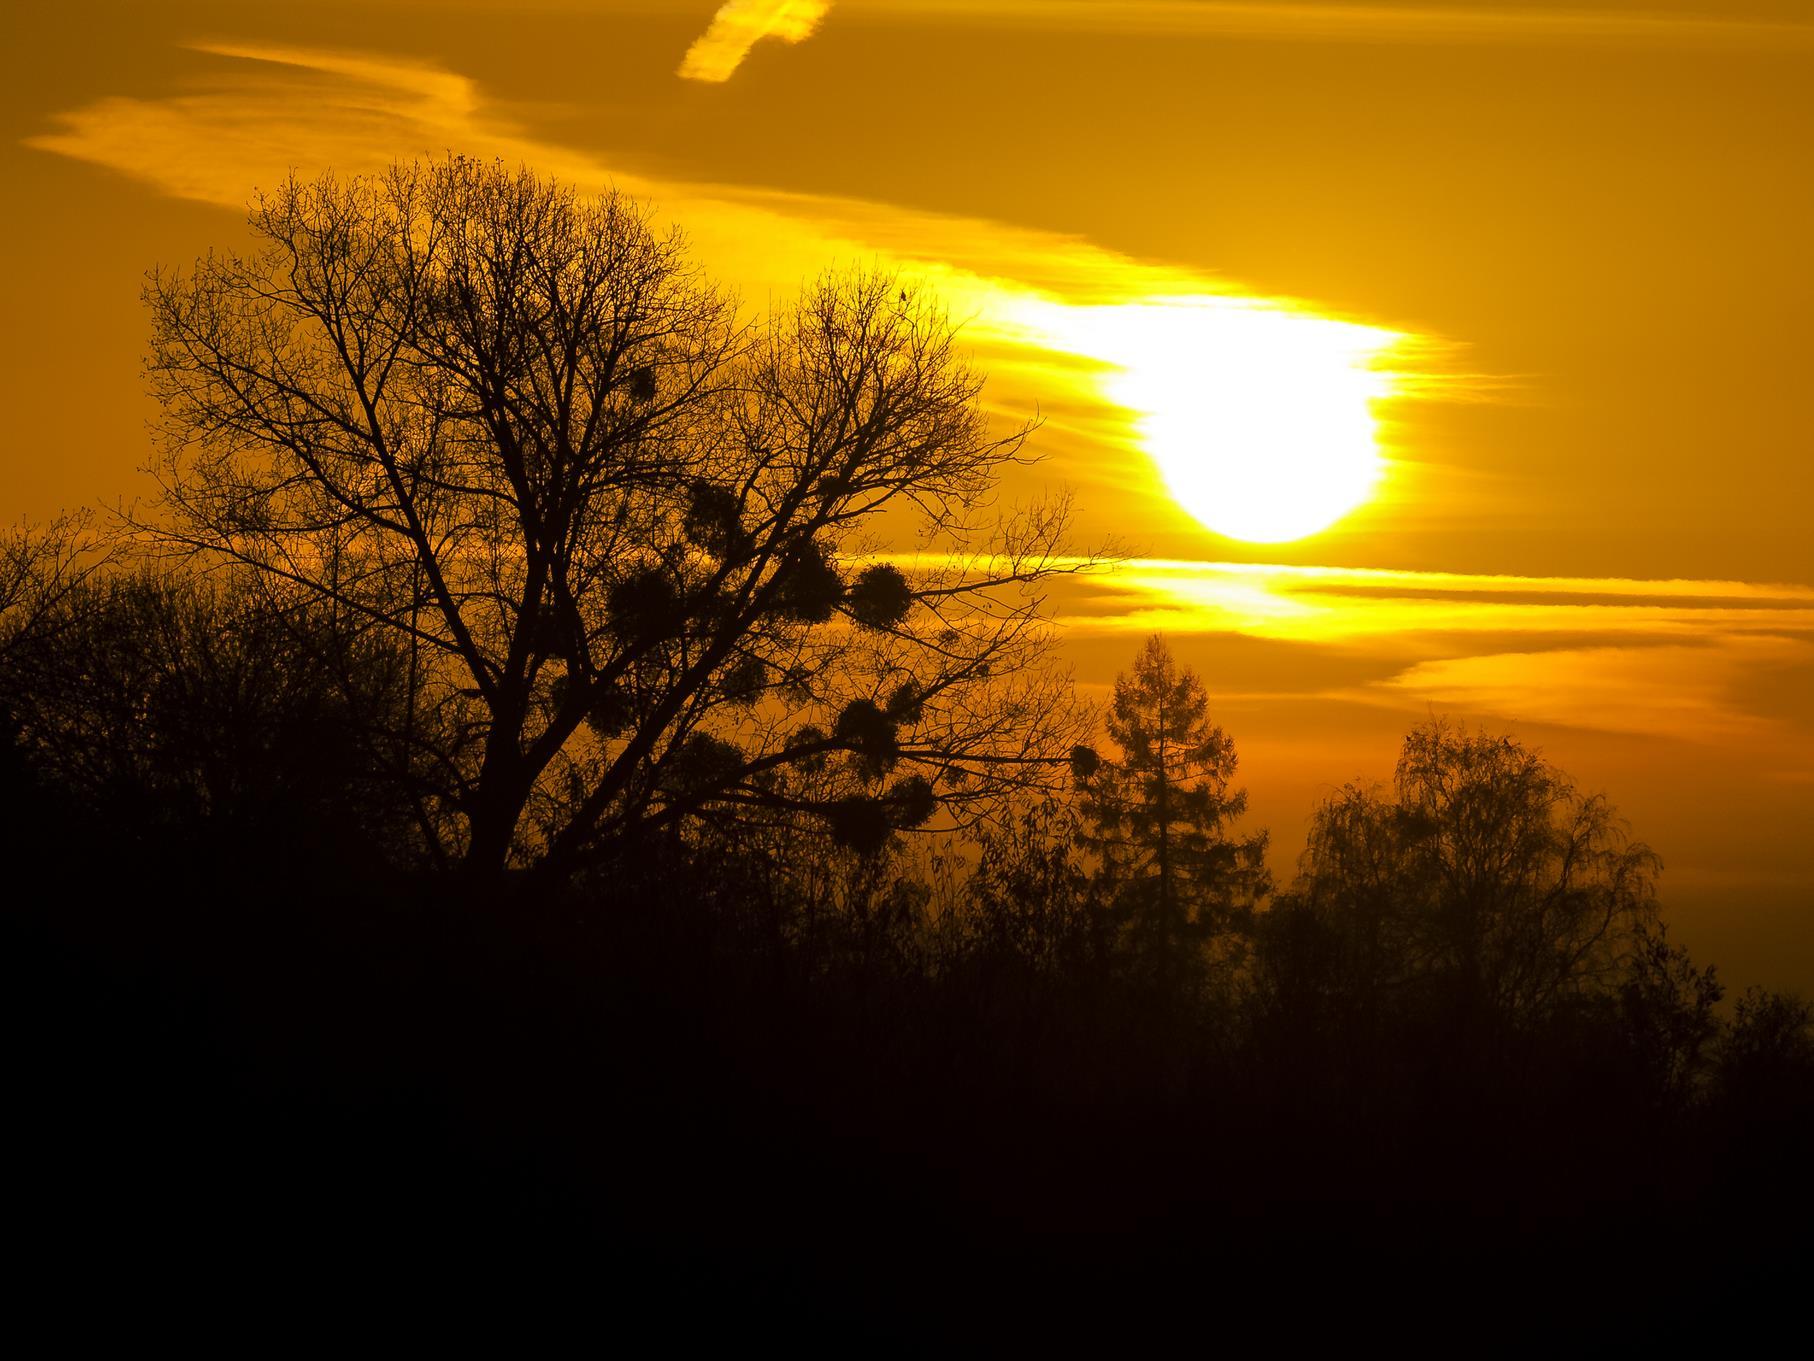 Kahle Bäume in der Morgensonne.